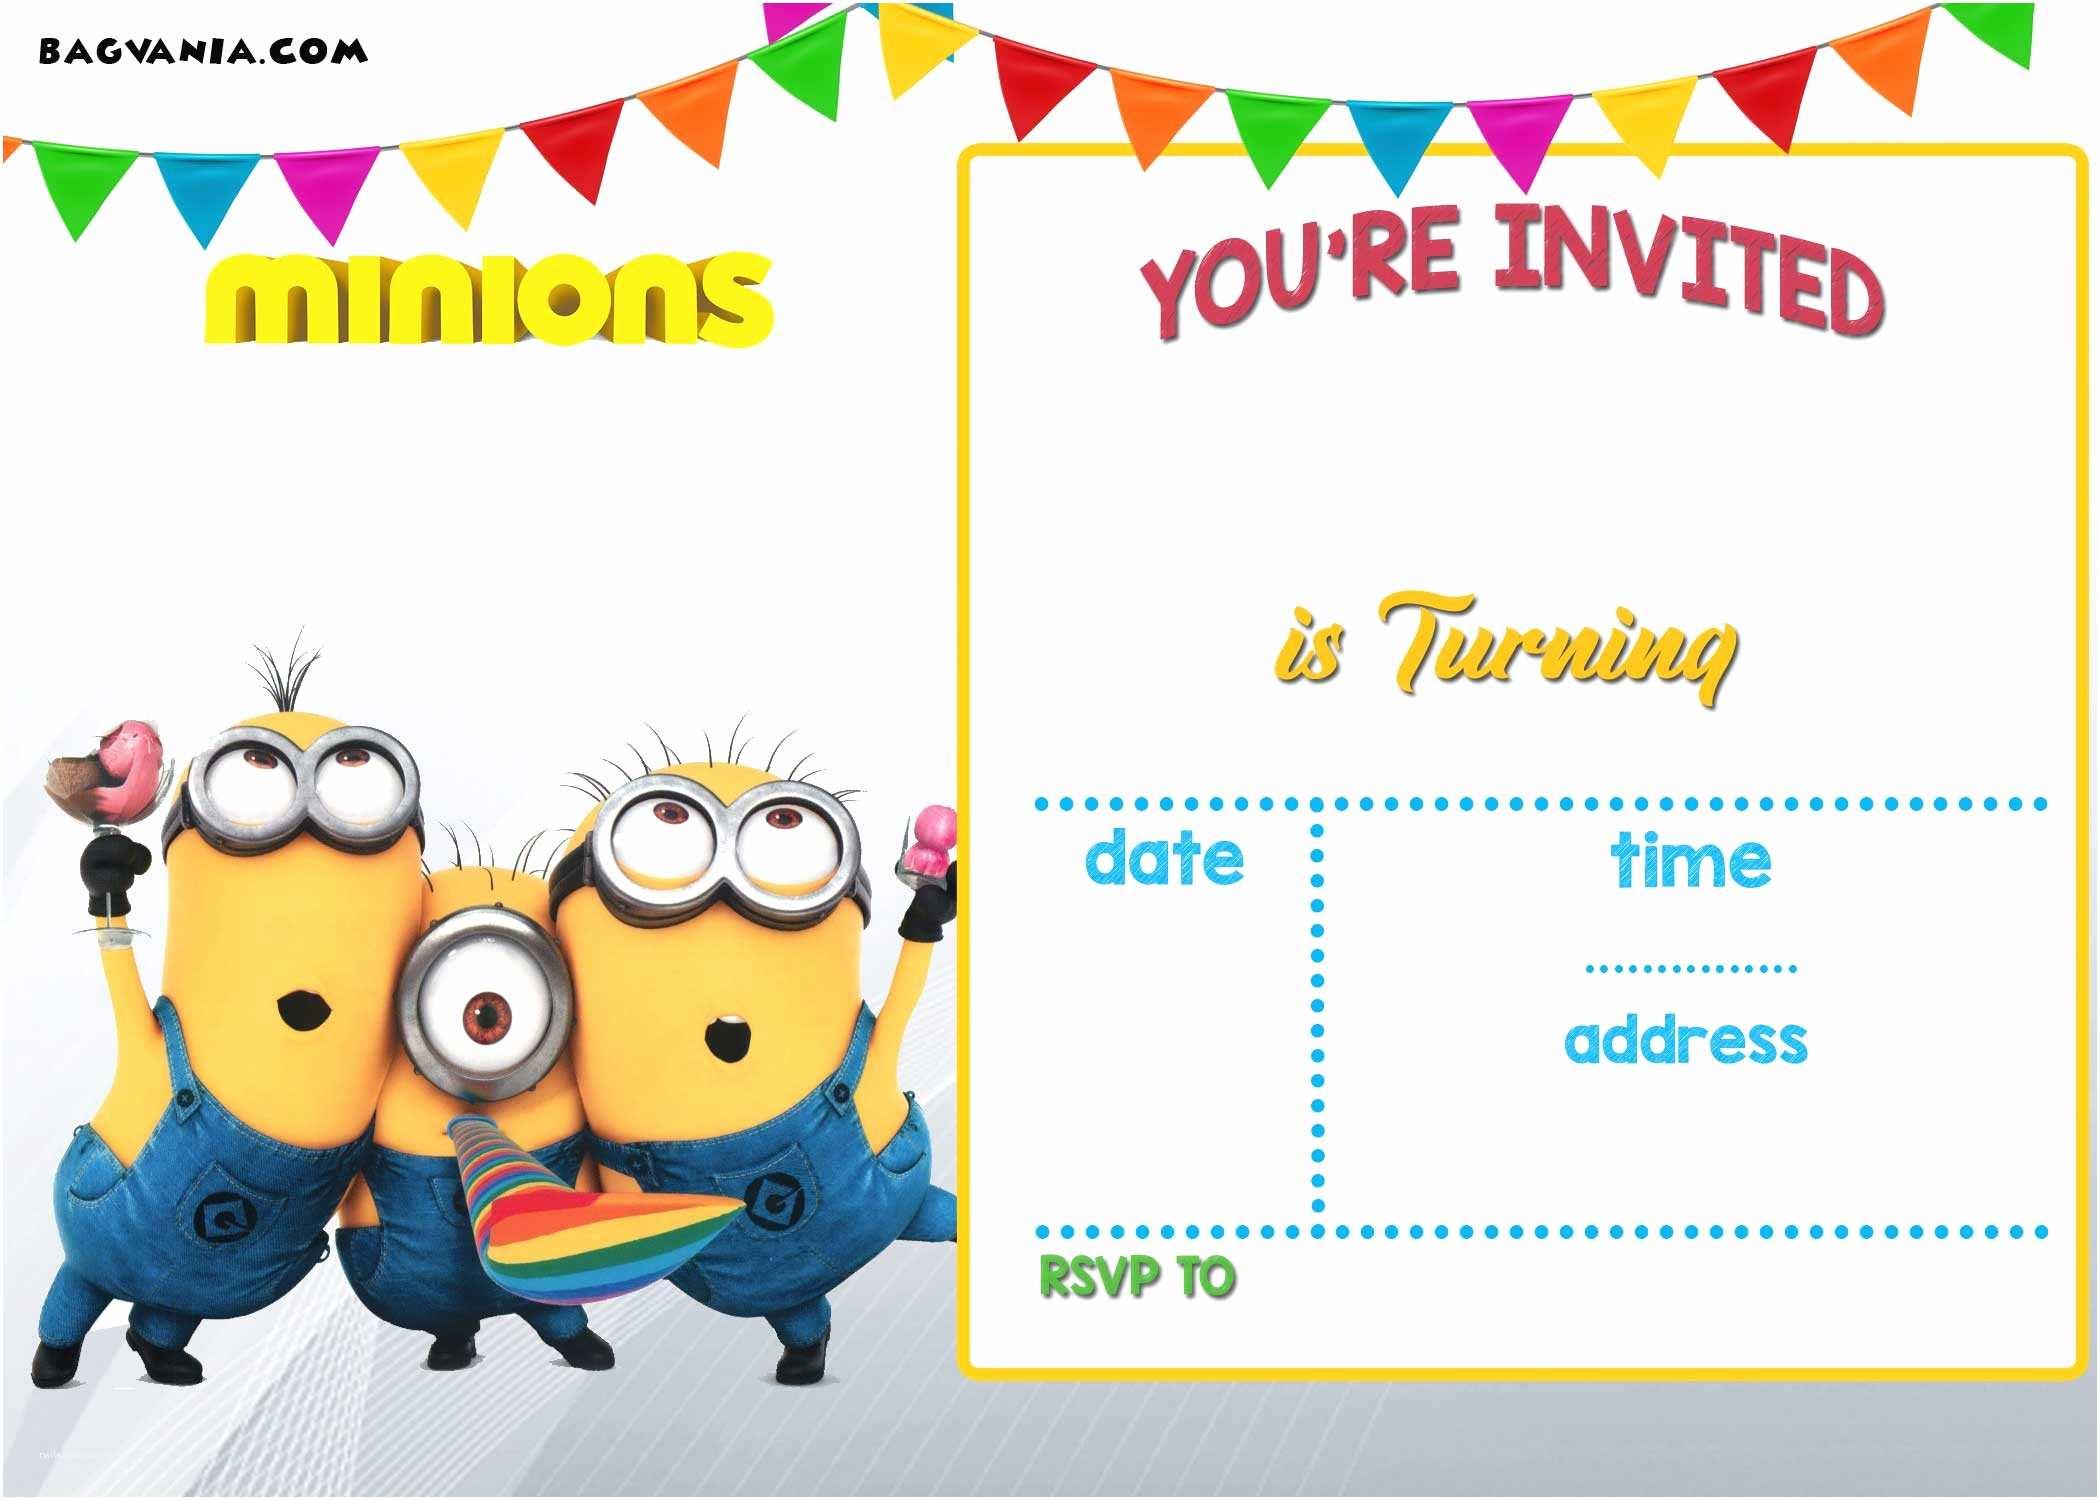 Free Birthday Invitation Templates Free Printable Minion Birthday Invitation Templates